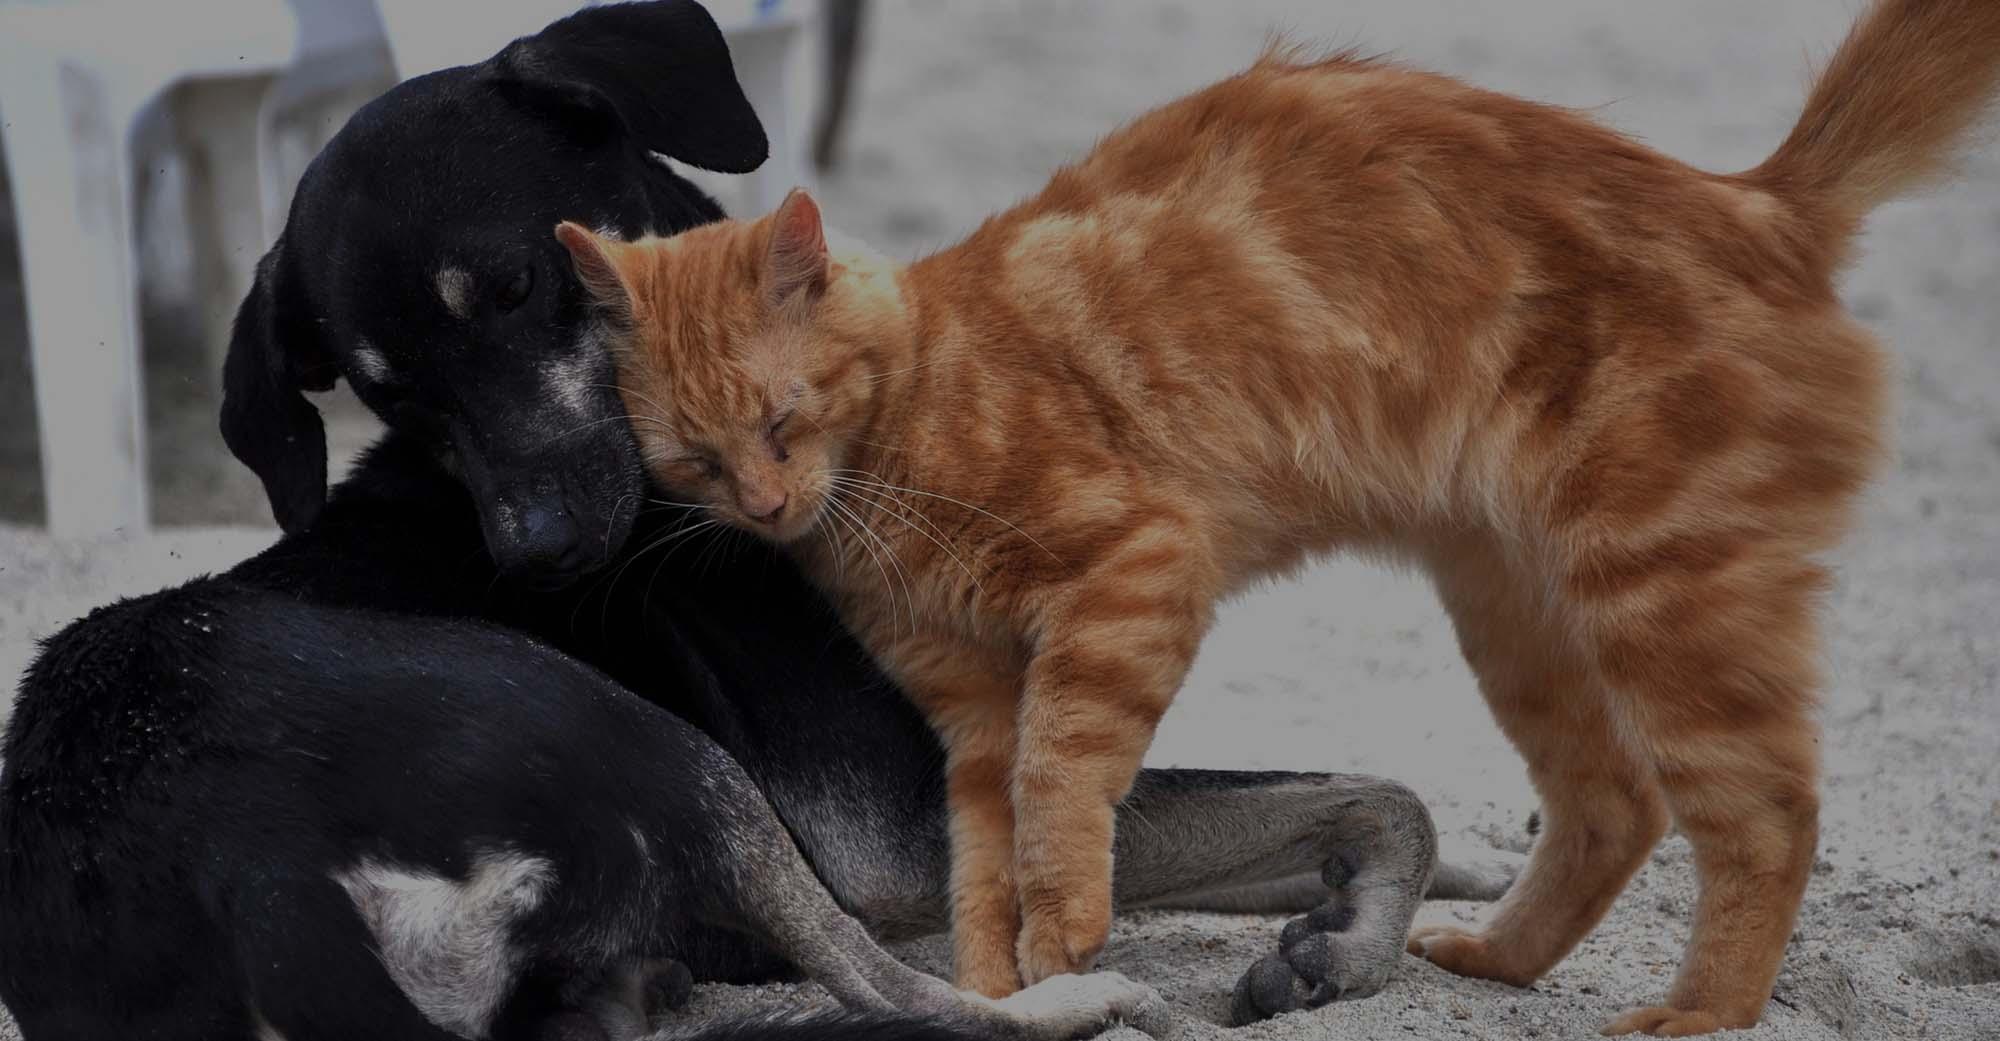 Association Mona-lise refuge pour animaux adoption header